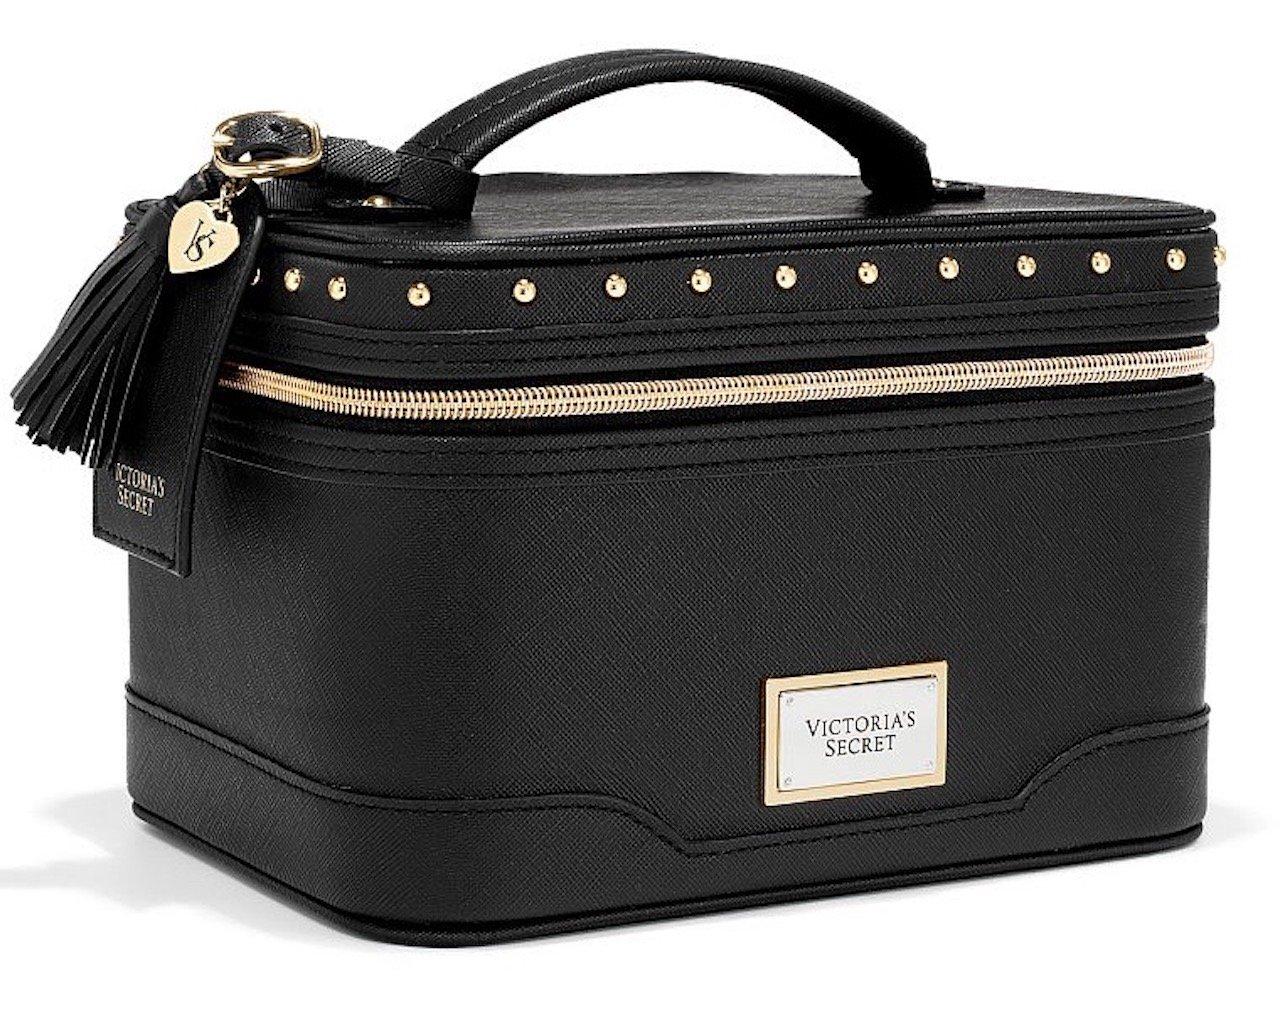 How To Make A Book Cover Out Of A Victoria S Secret Bag ~ Amazon.com : victorias secret hard cosmetic bag train case black